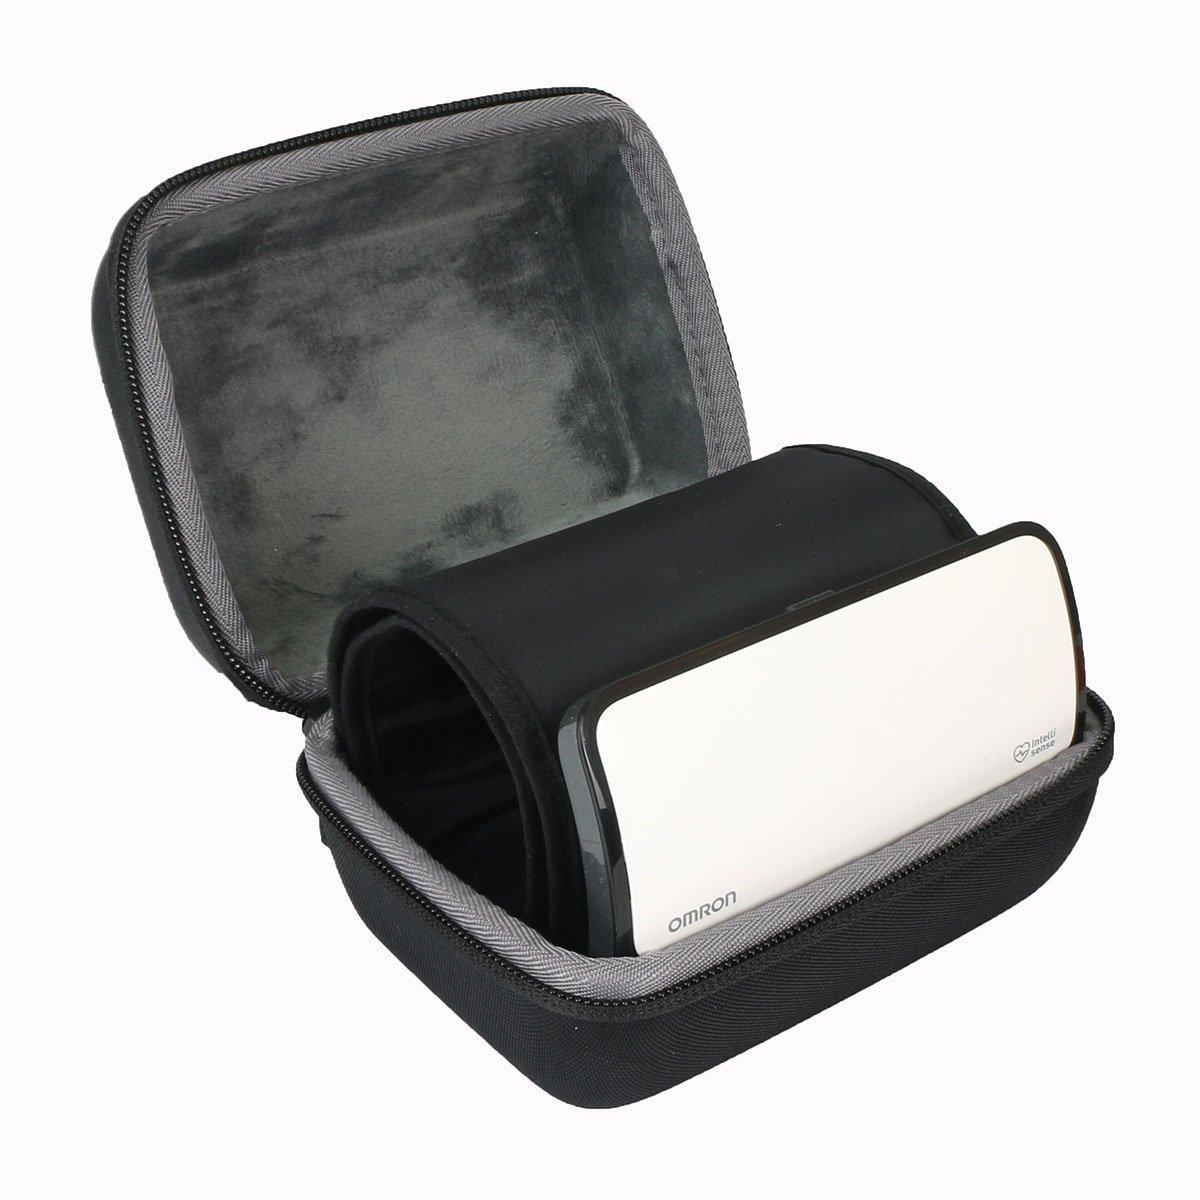 Gaming Mice Hard Travel Case for Logitech G602 Lag-Free Wireless